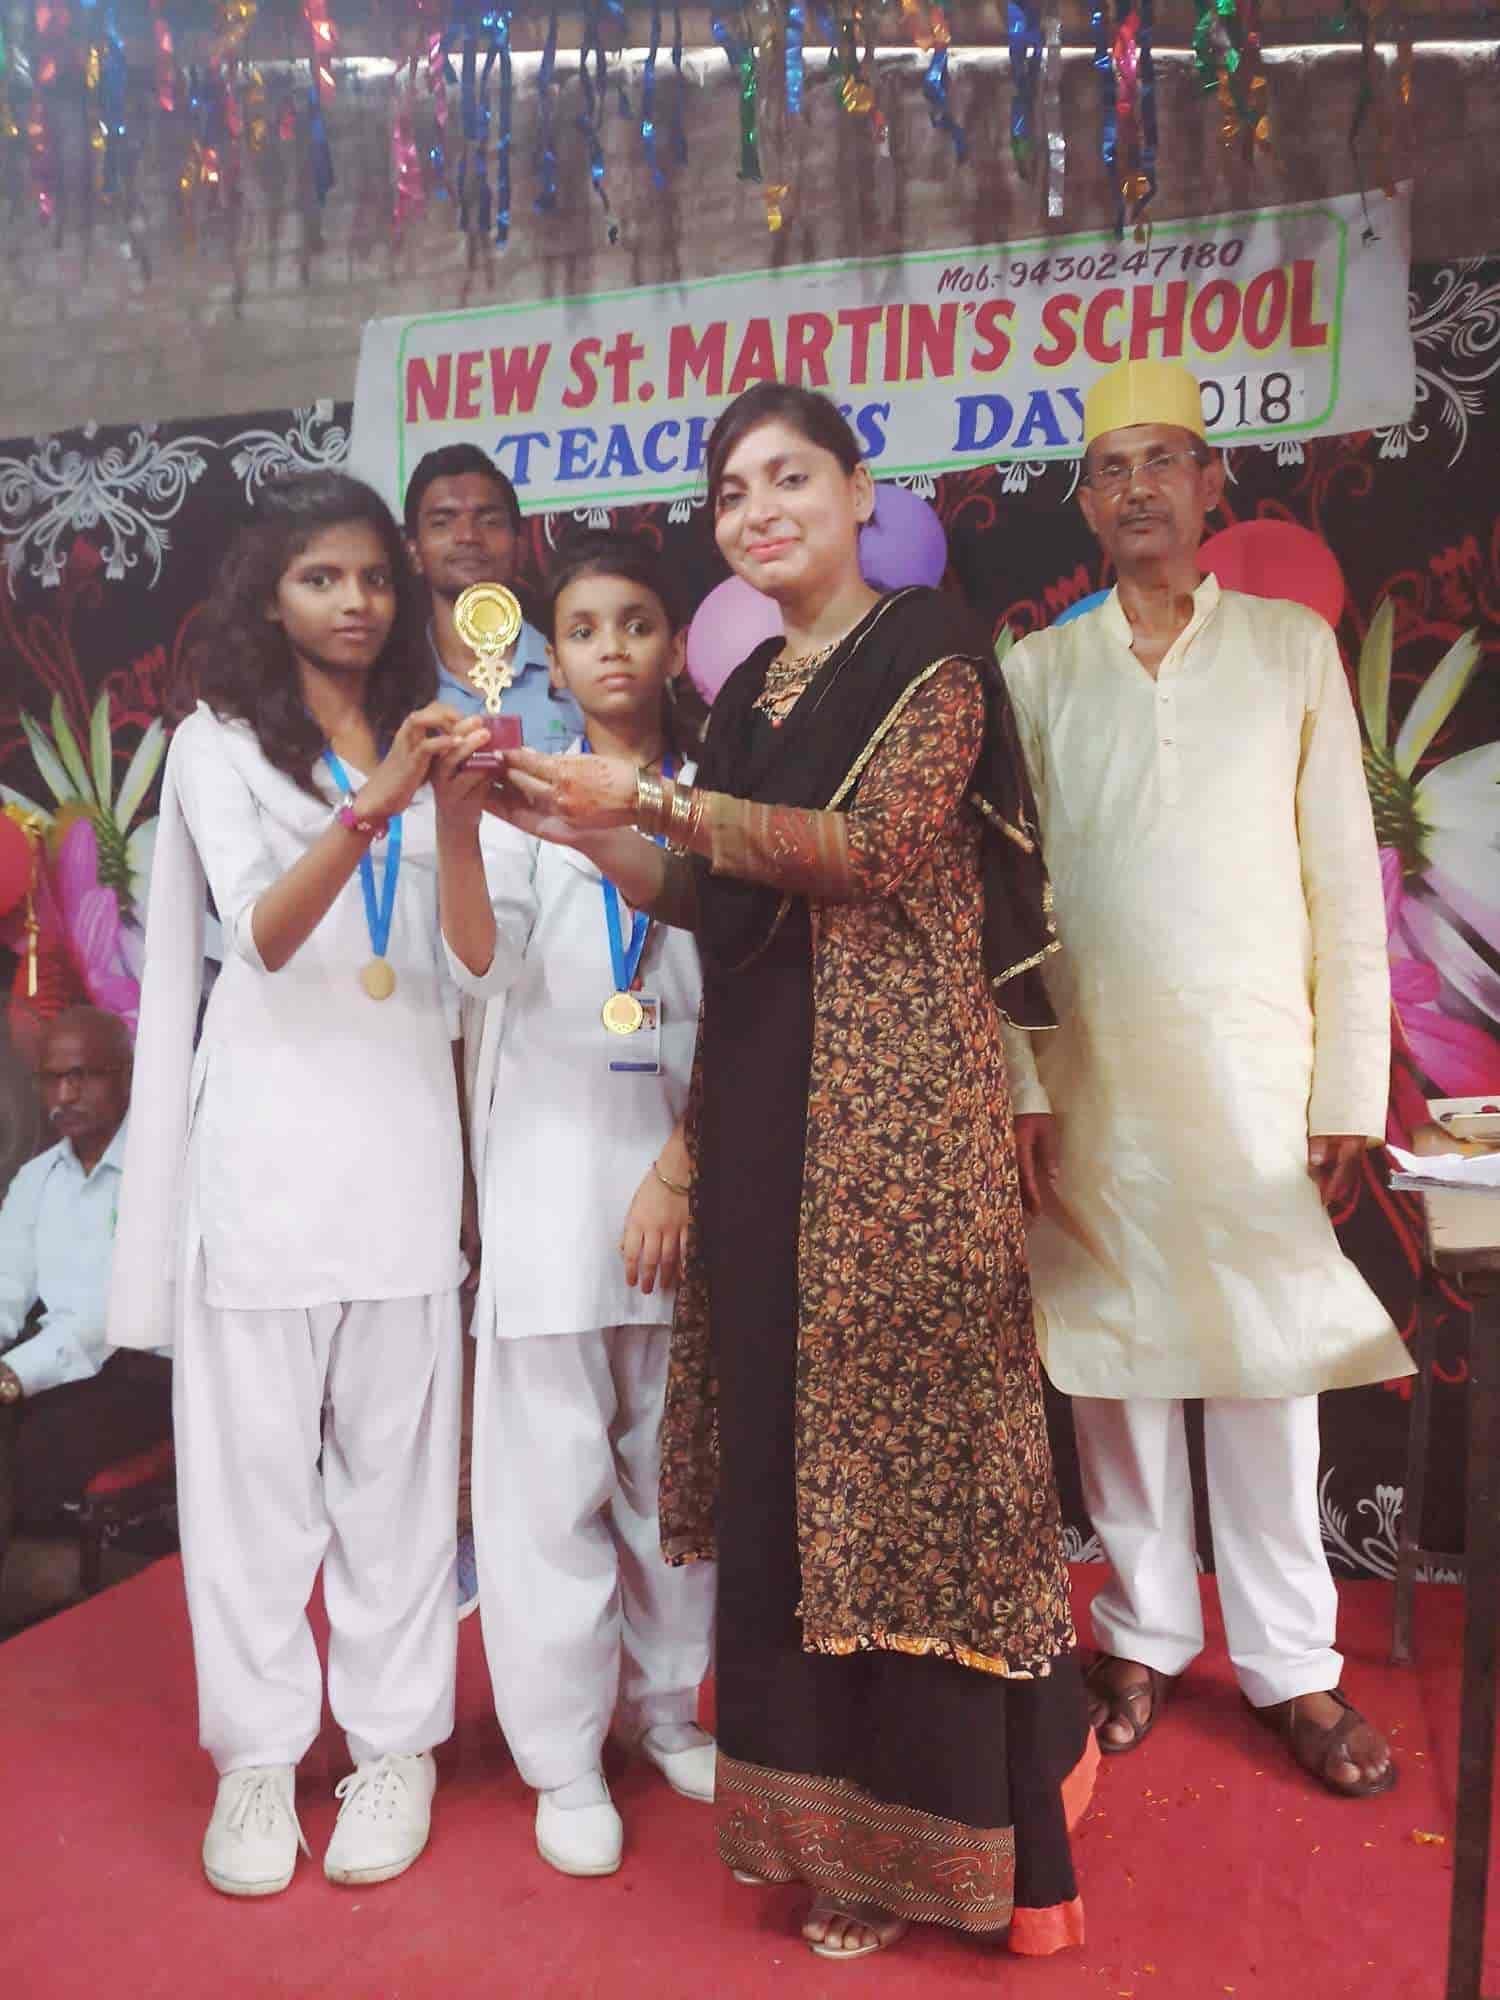 New St Martins School, Biharsharif - Schools in Nalanda